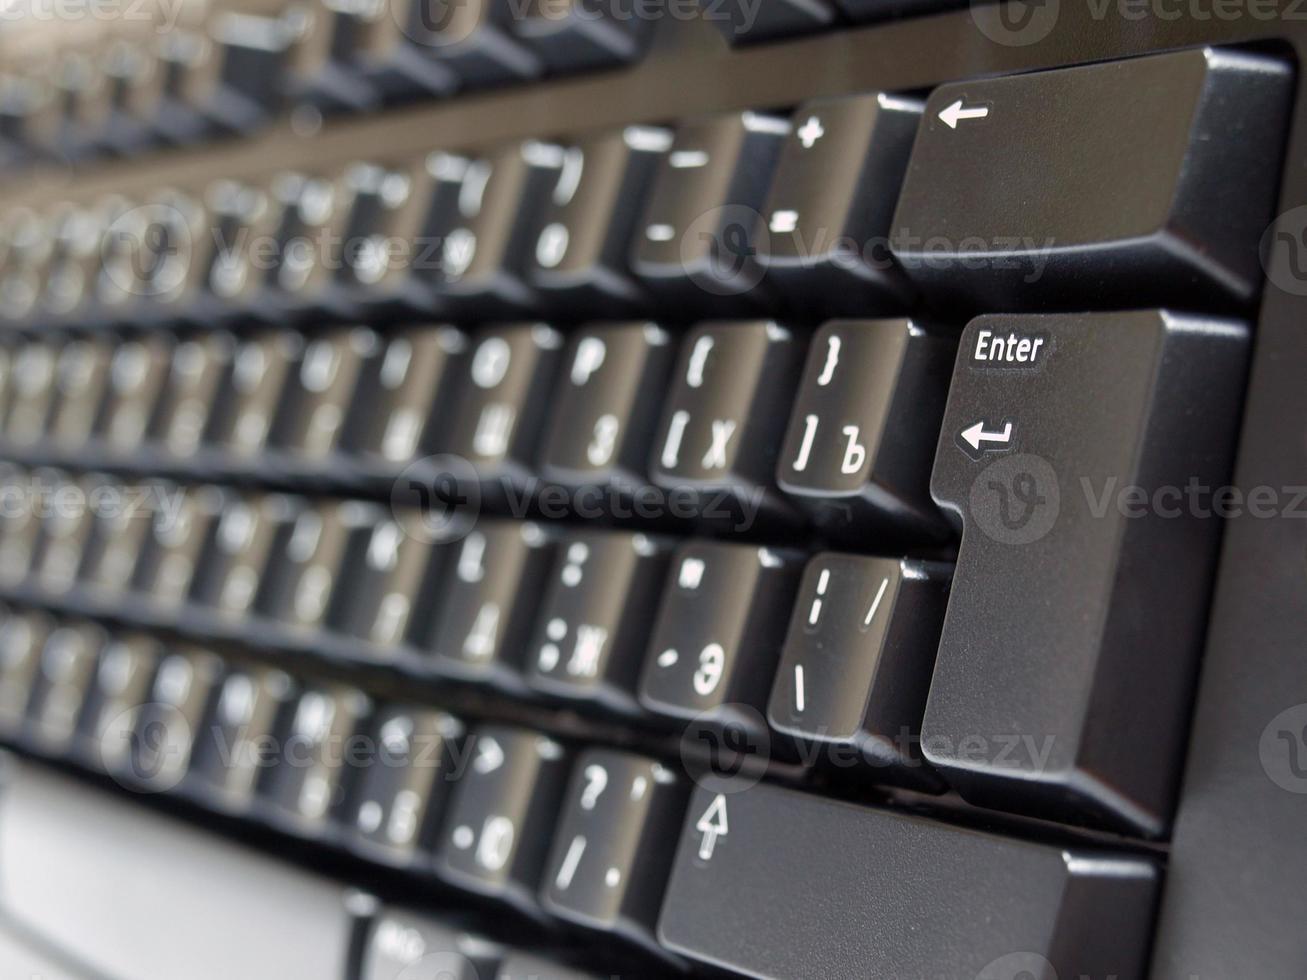 zwart toetsenbord close-up foto